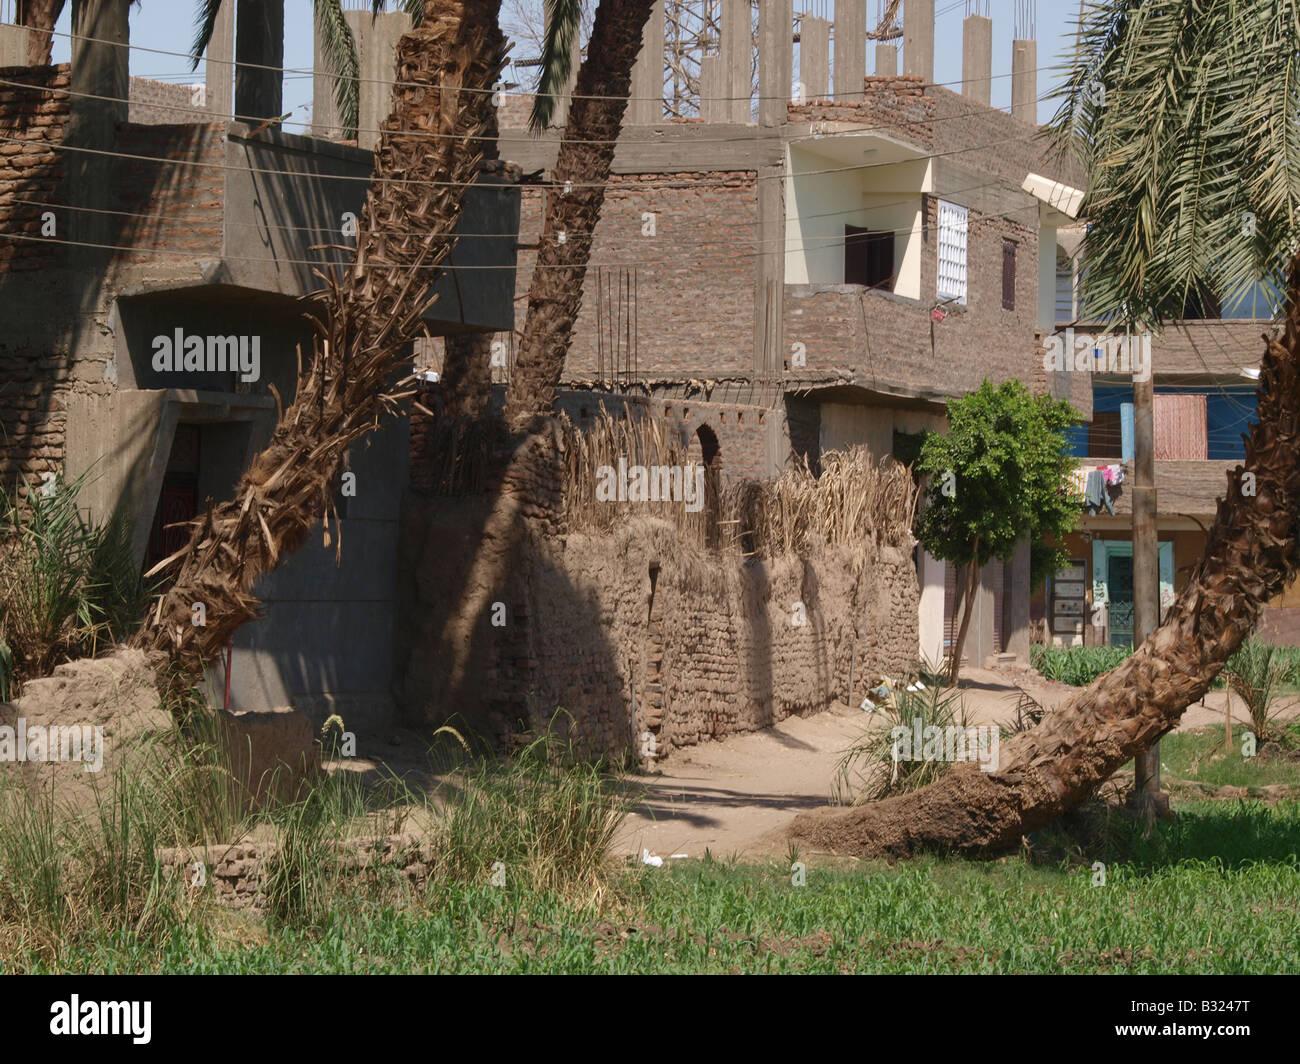 Houses in Luxor, Egypt, Africa - Stock Image